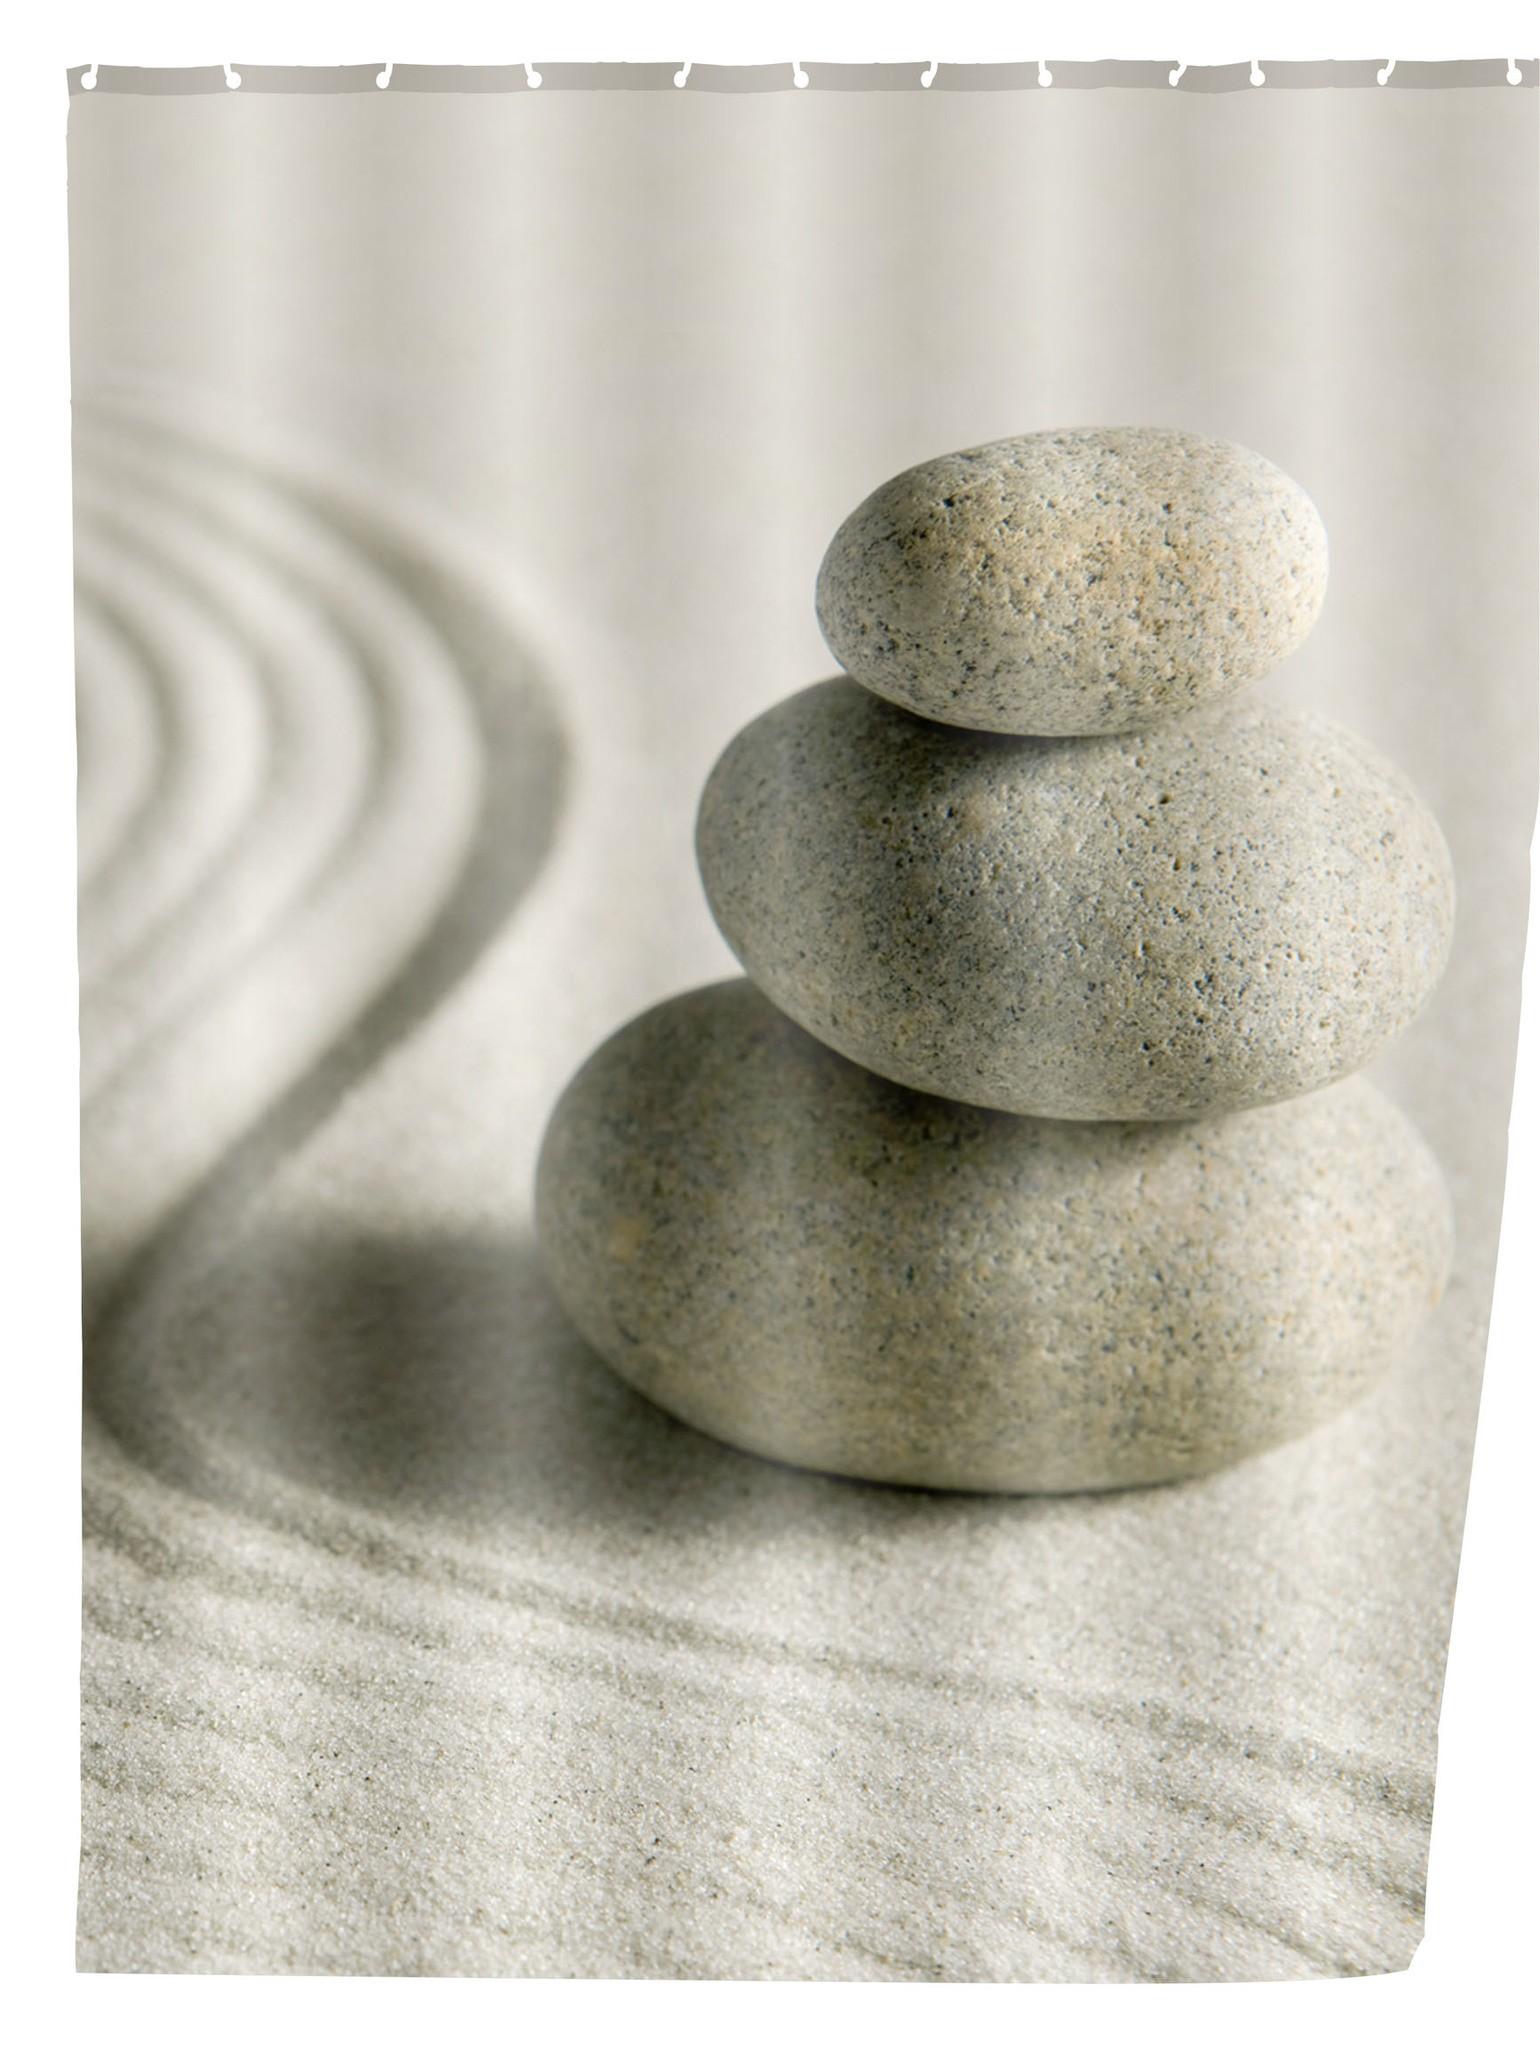 Duschvorhang Sand & Stone, 180 x 200 cm, waschbar